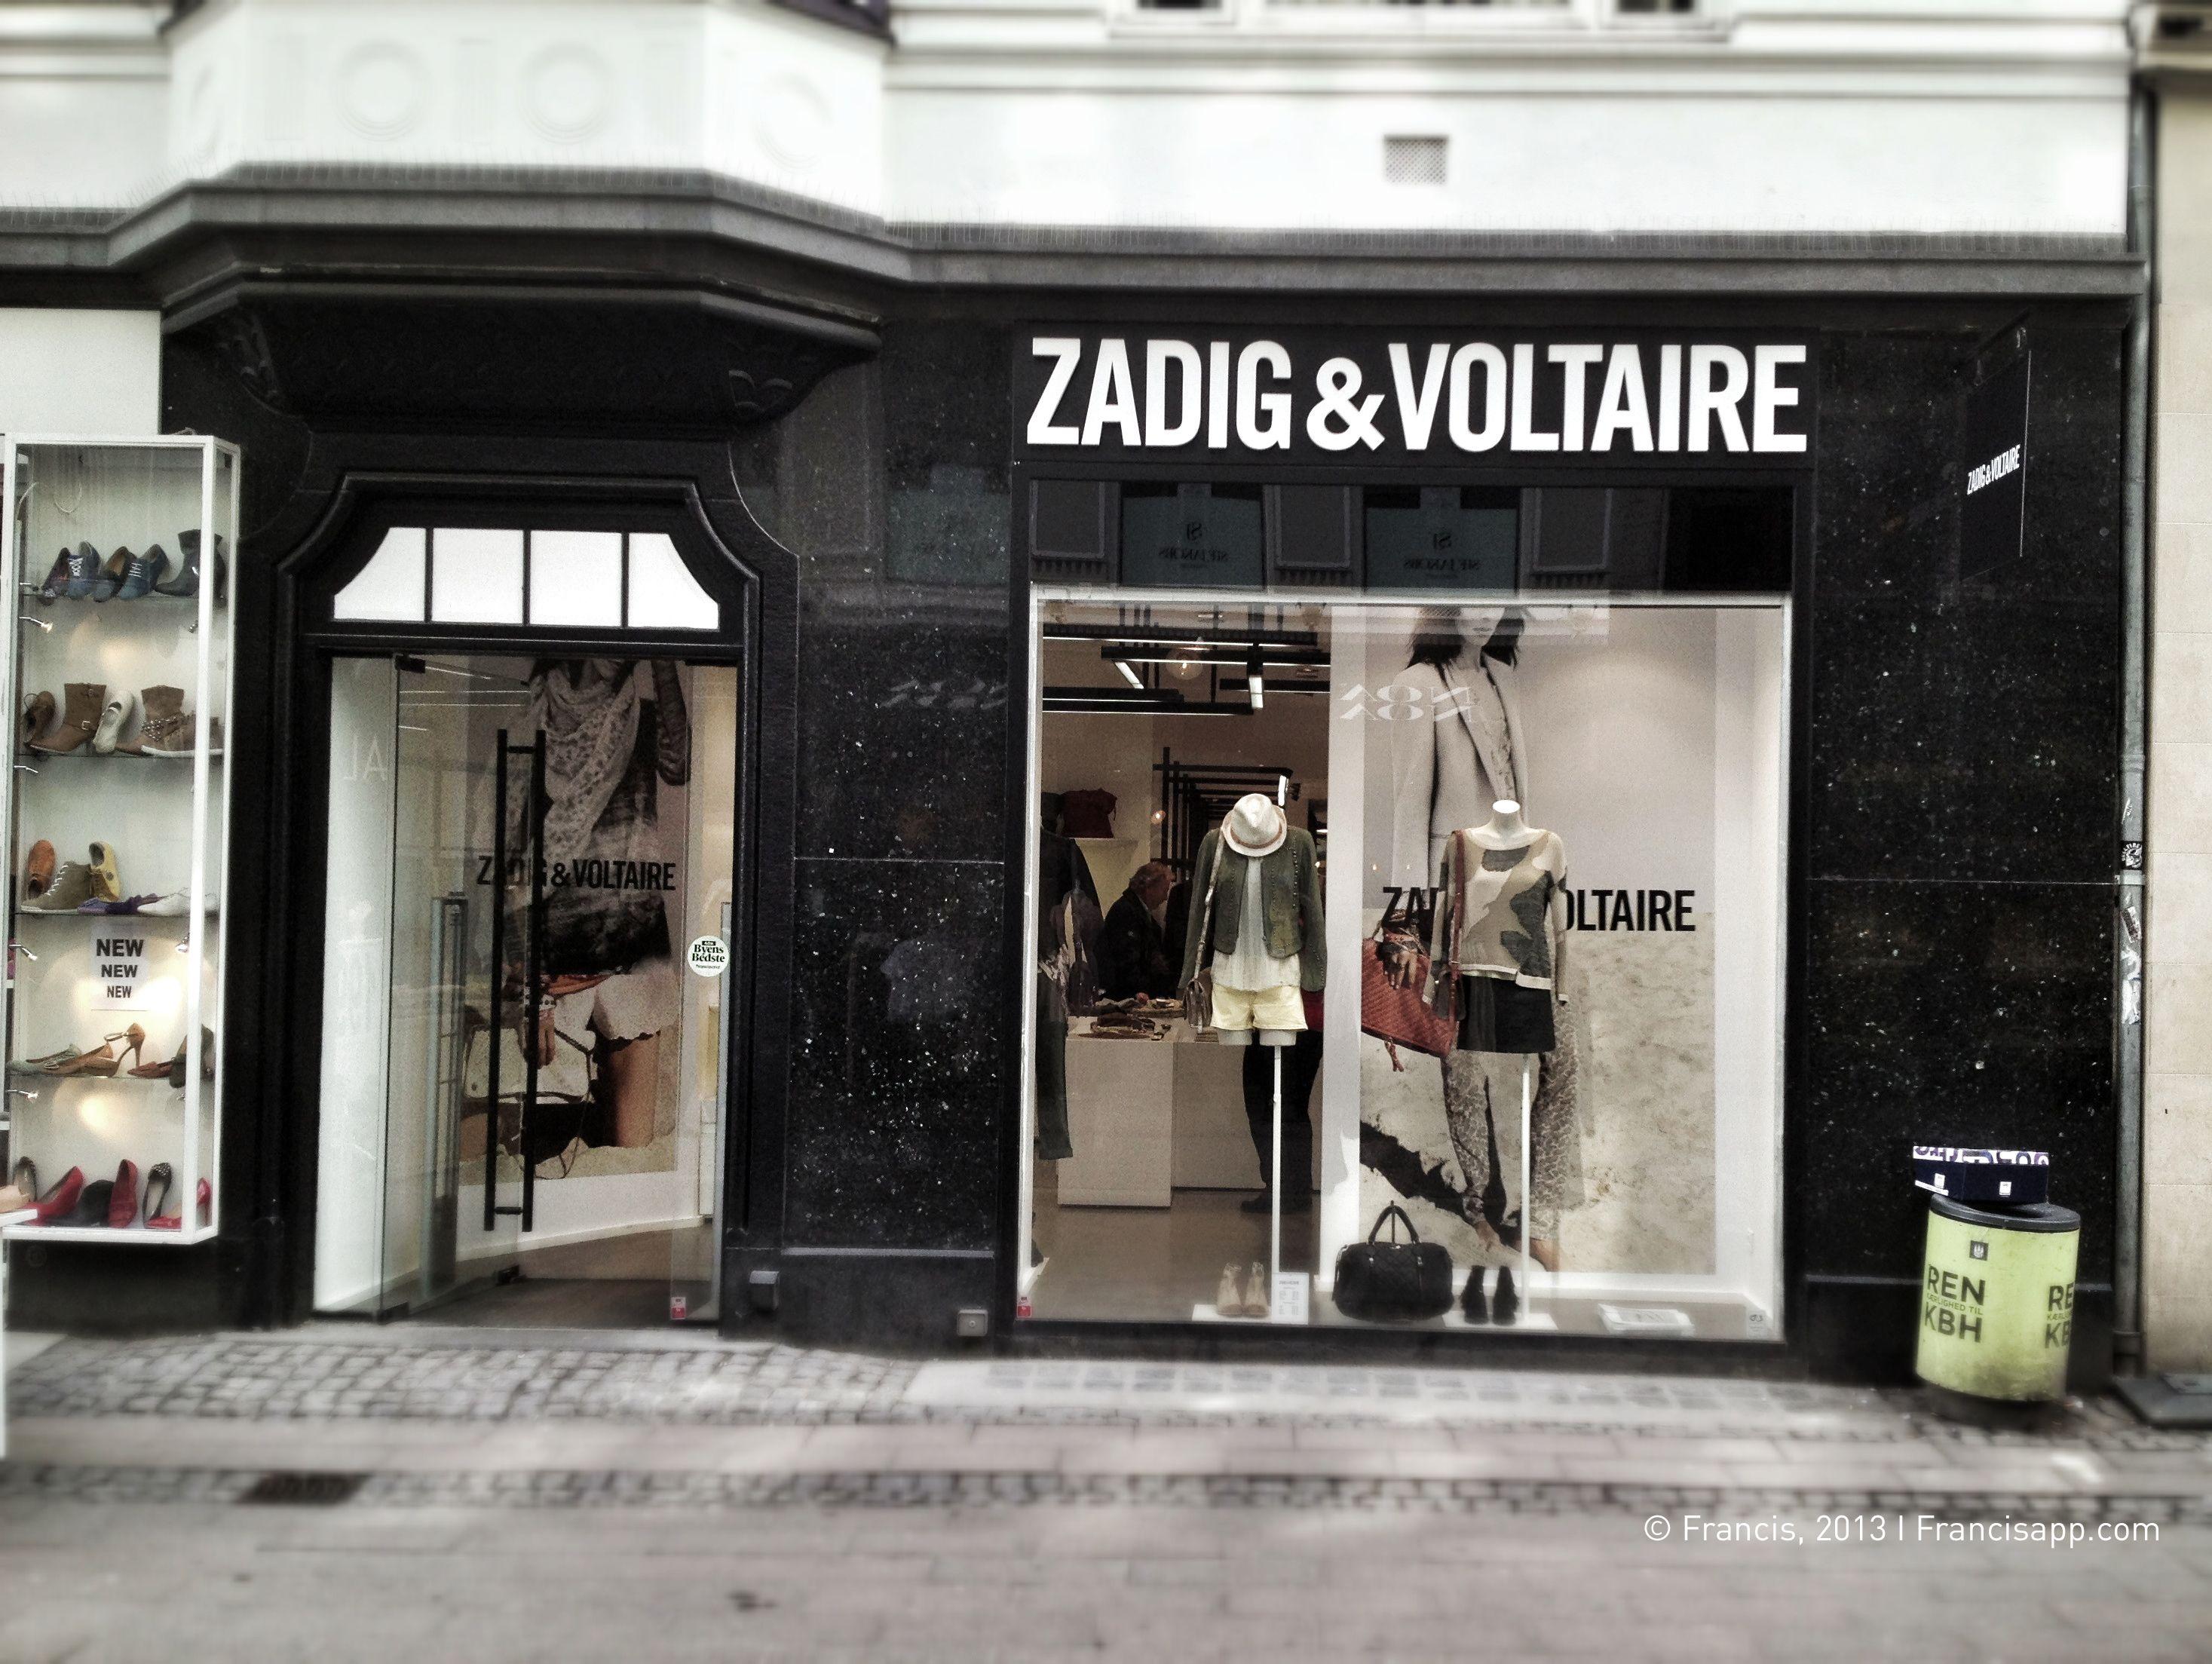 Zadig&Voltaire, Strøget, Copenhague. Francis, 2013 I Francisapp.com